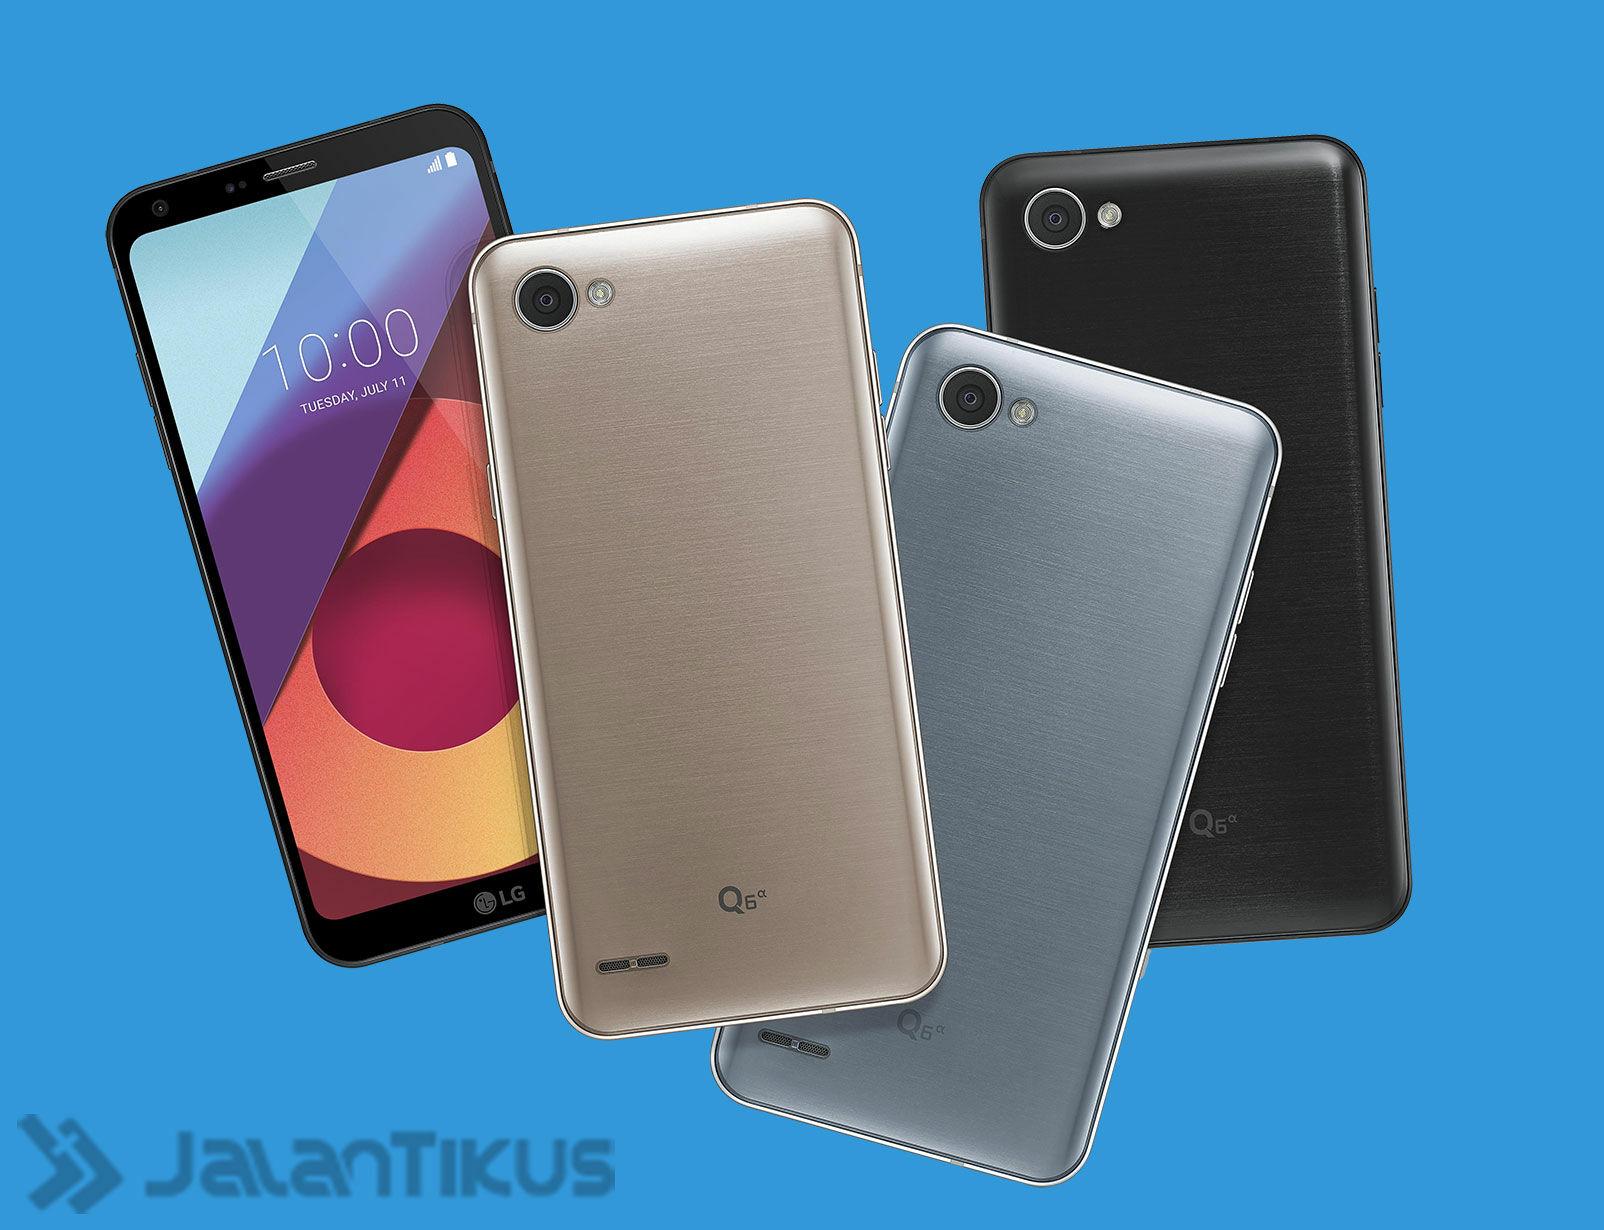 Smartphone Android Terbaru Agustus 2017 4